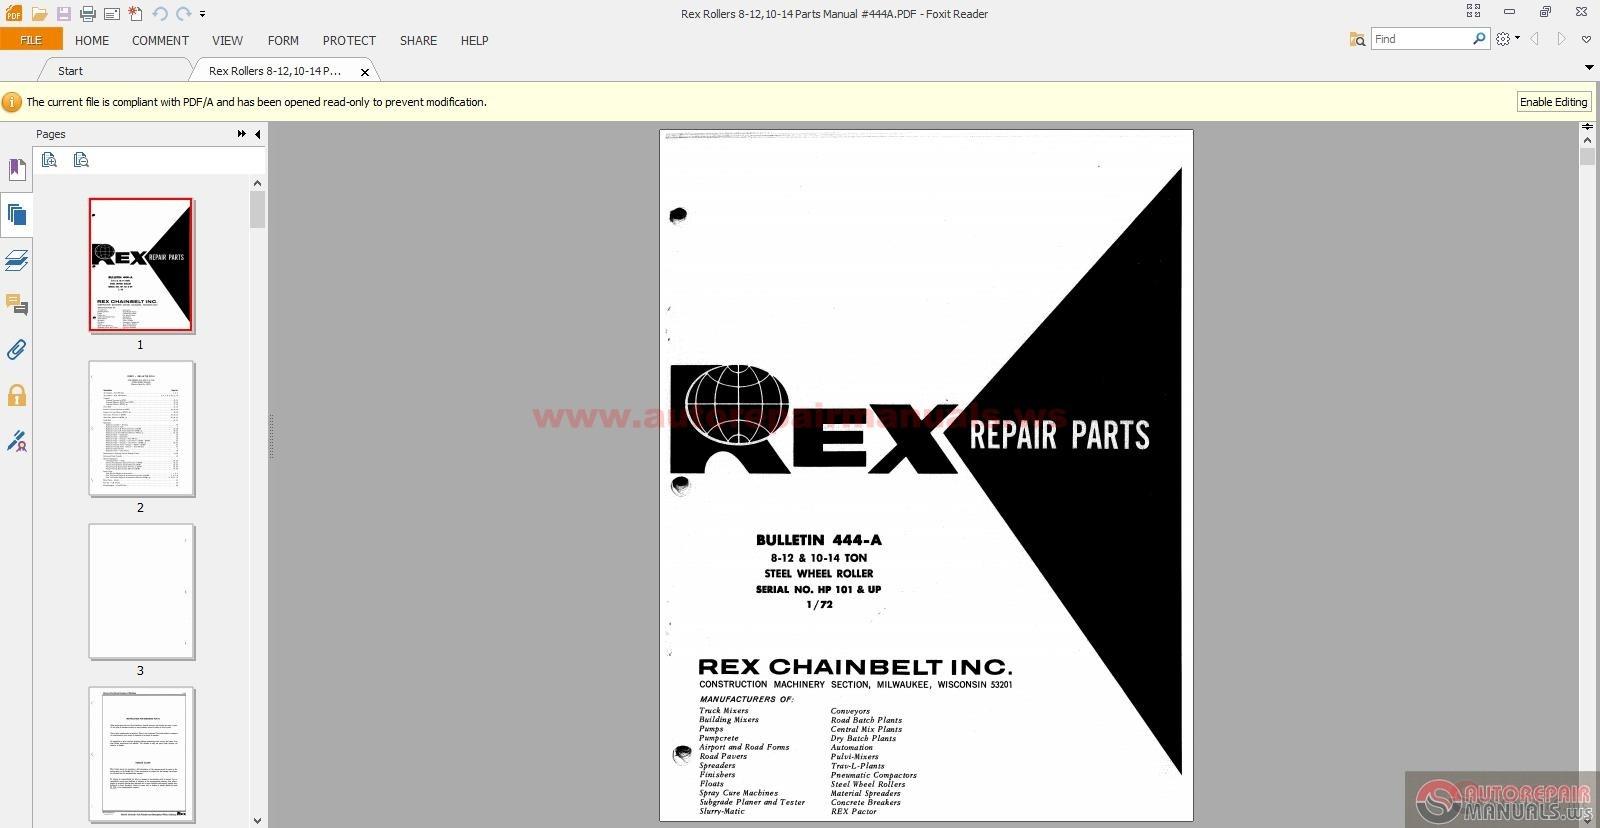 Rex Rollers 8